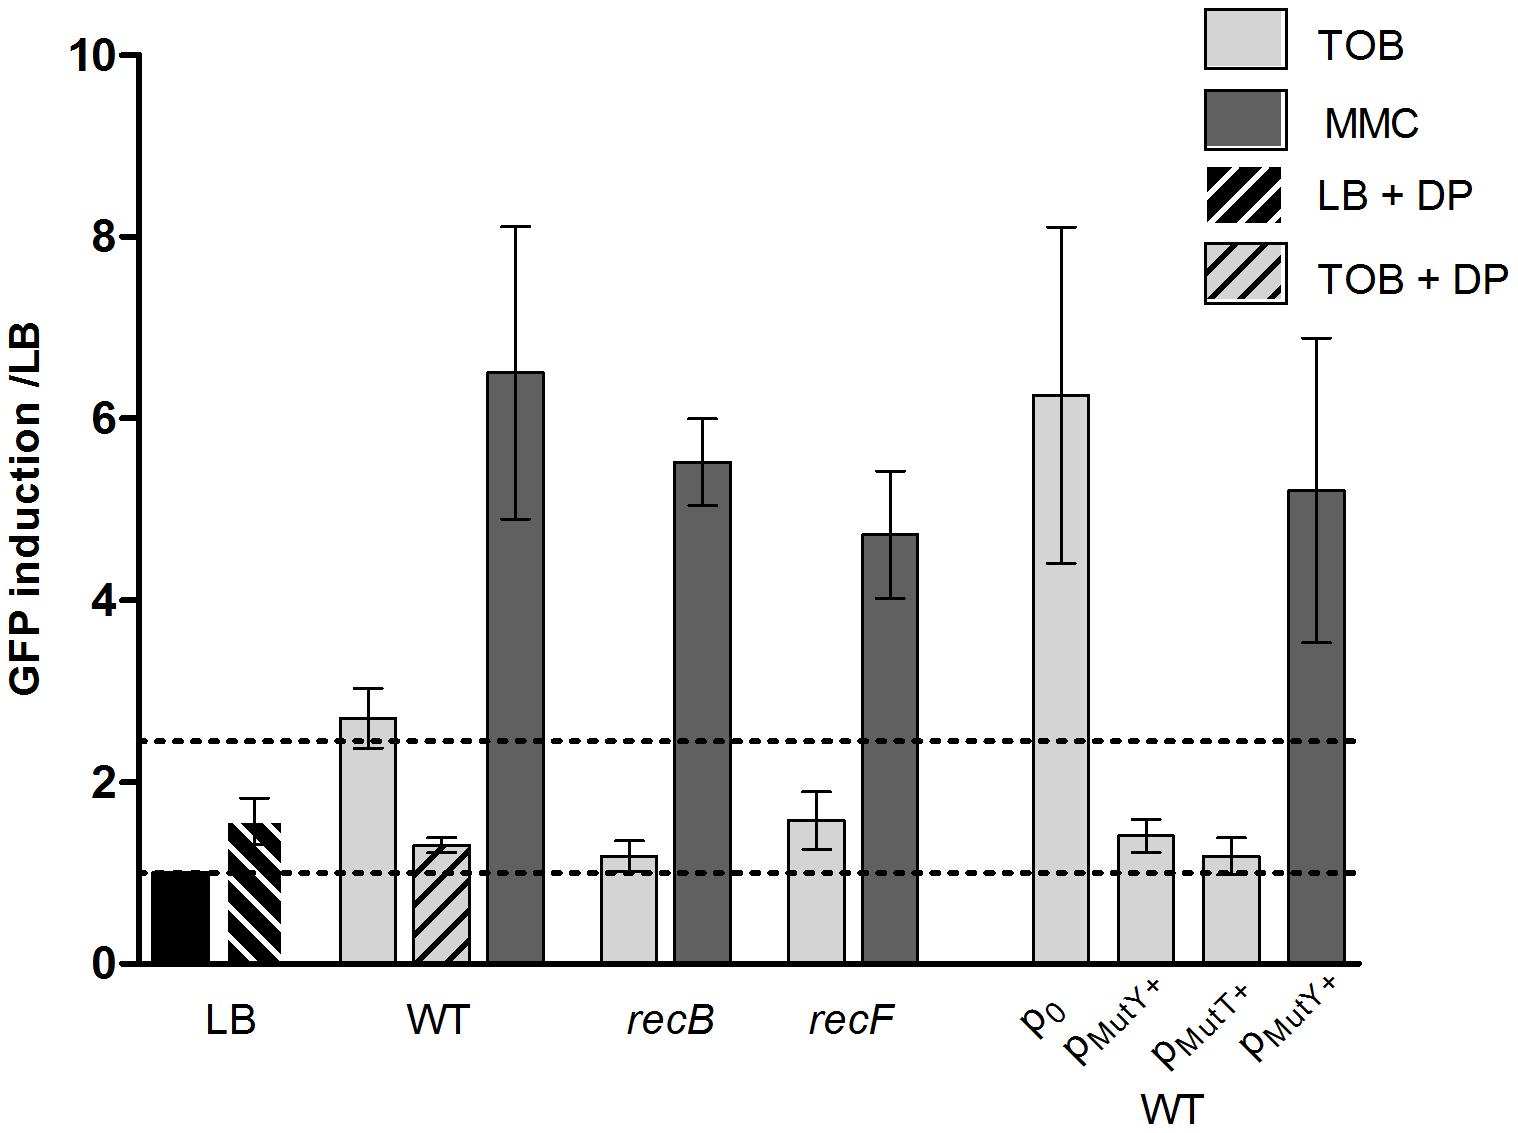 Factors modulating SOS induction by tobramycin in <i>V.</i>cholerae.